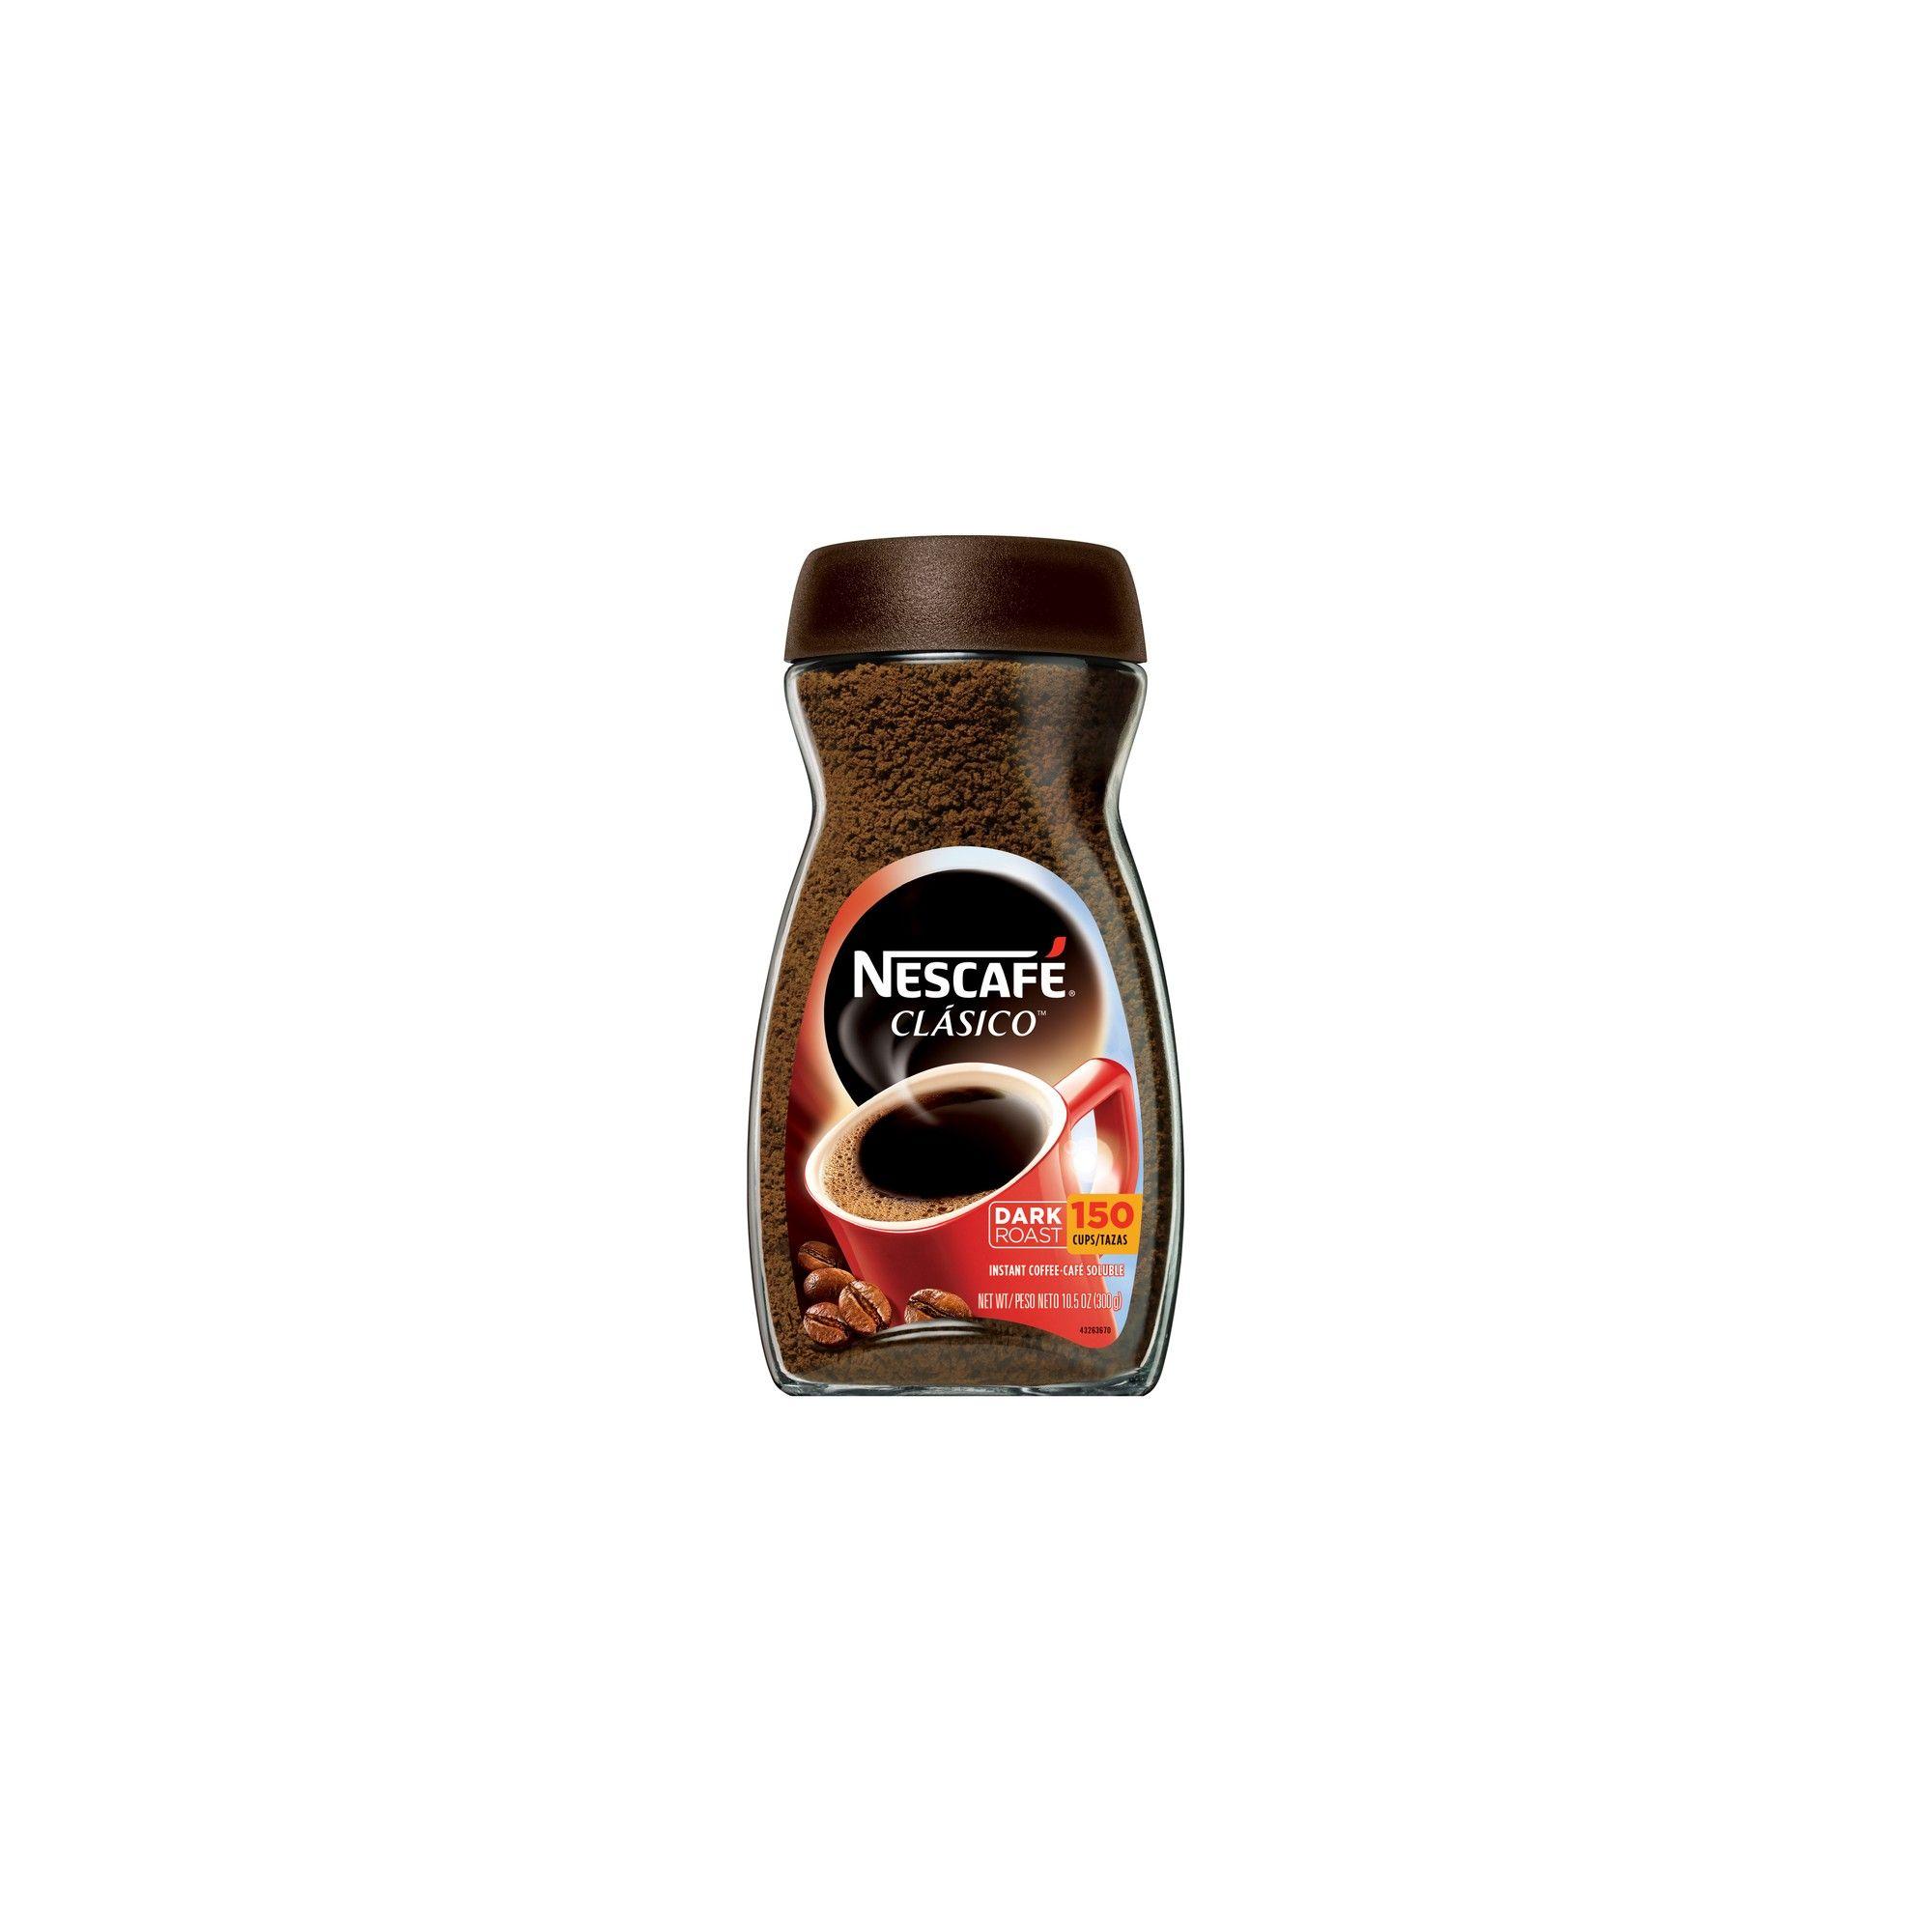 Nescafé Classico Dark Roast Instant Coffee 10.5oz Dark